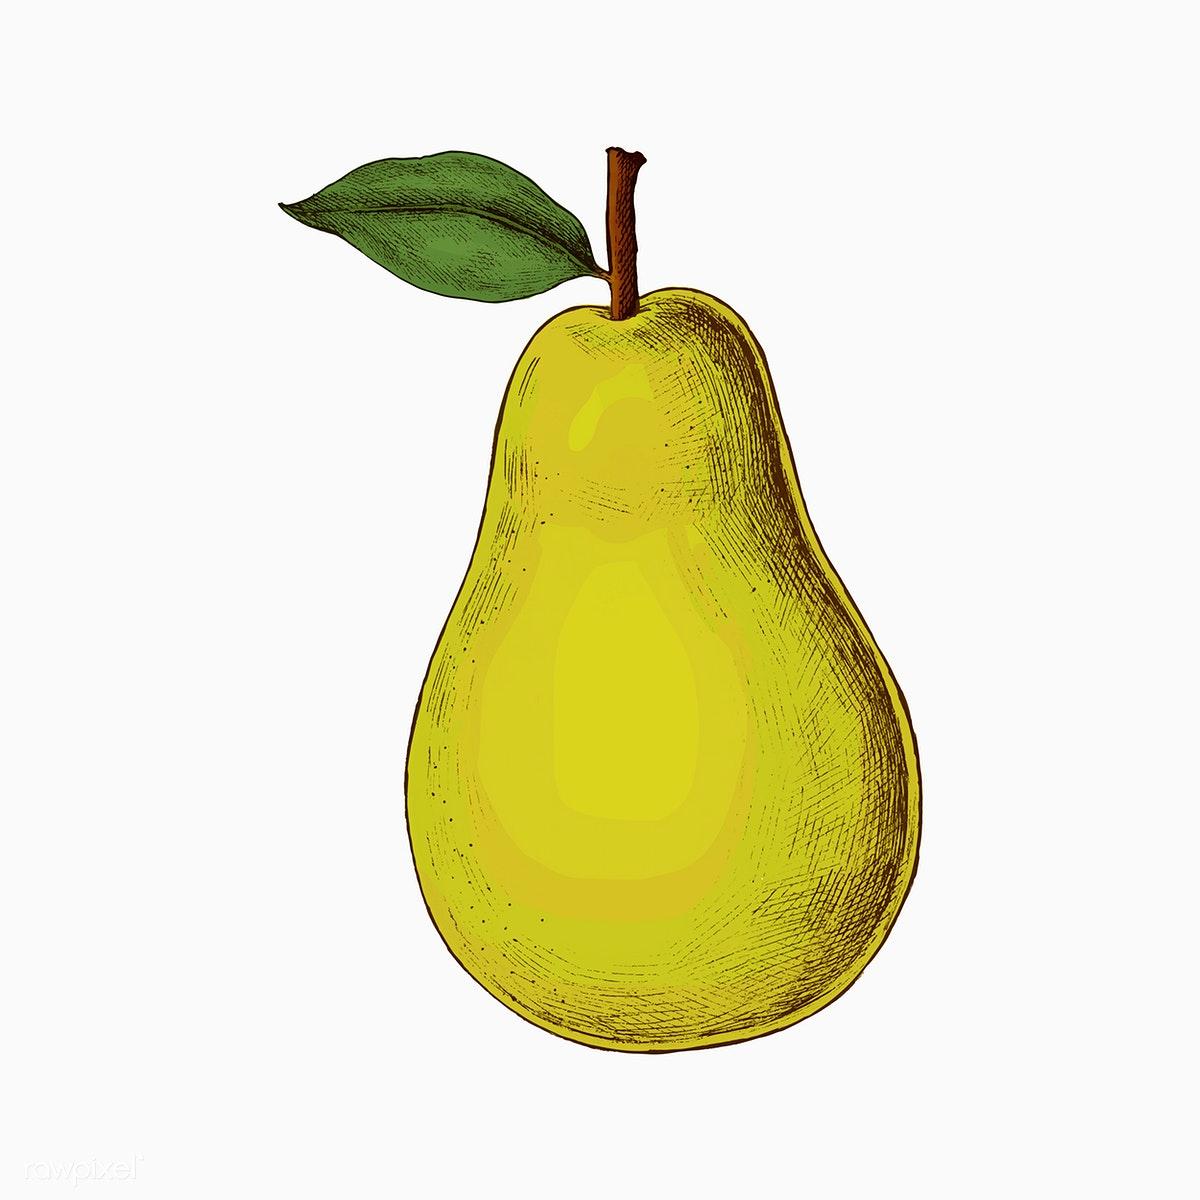 Download premium illustration of. Pear clipart illustrated